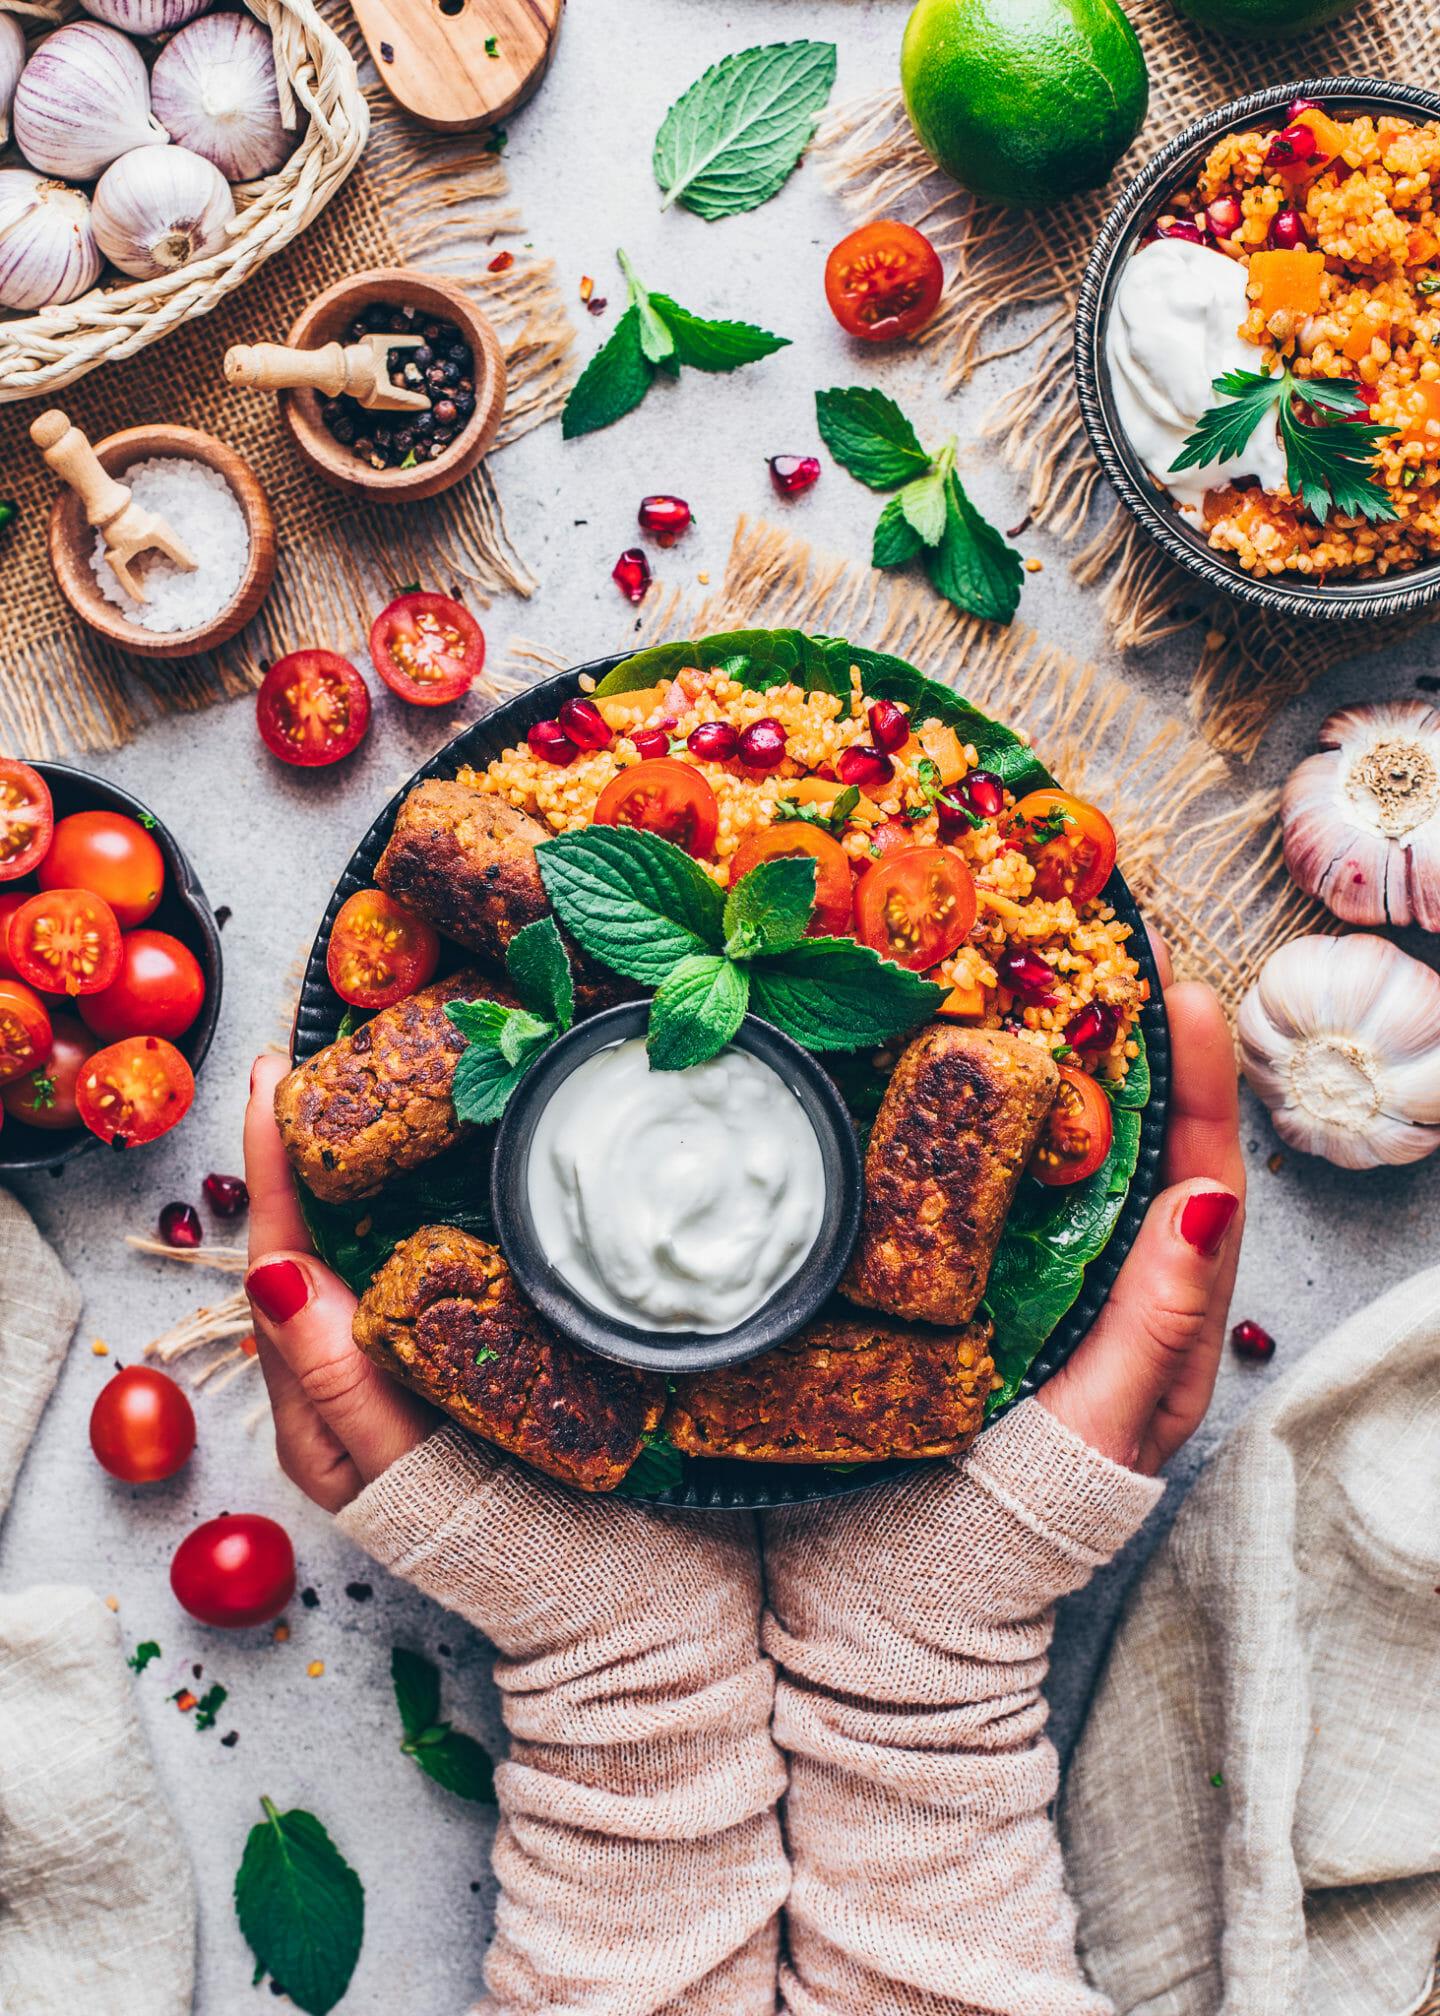 Vegan Cevapcici with Bulgur Salad and Tomatoes (Food Photography)